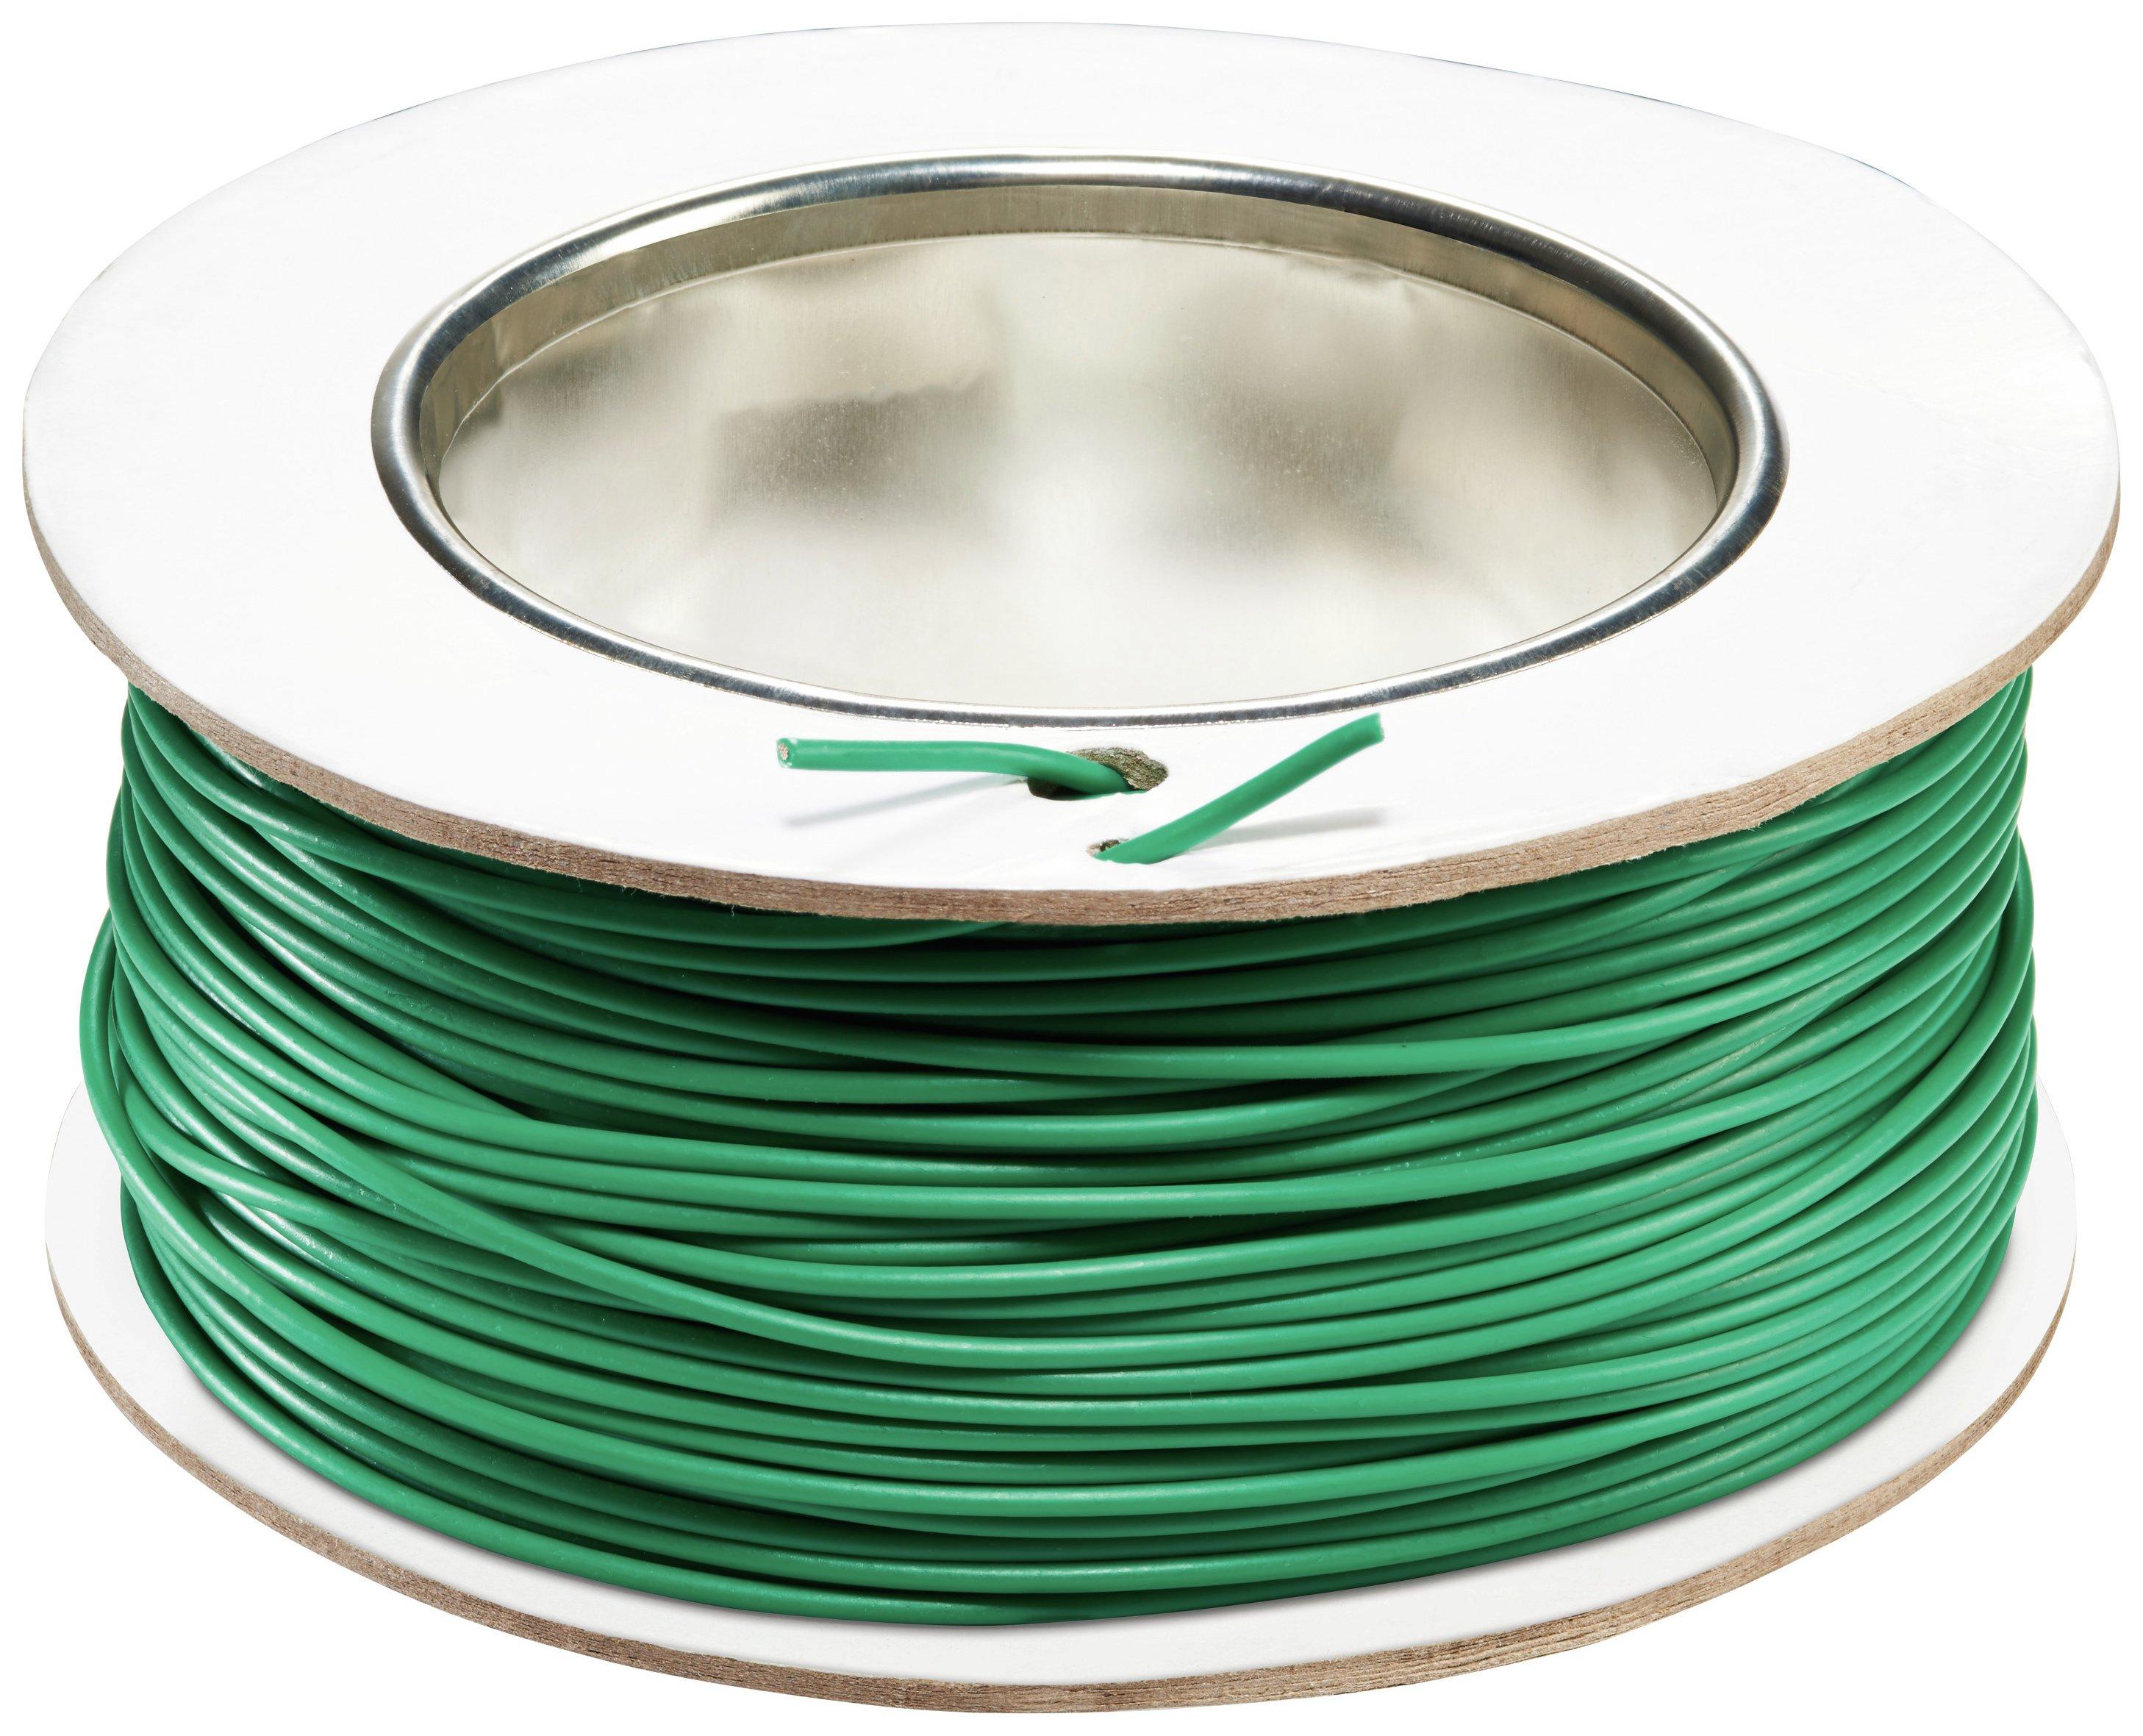 Bosch 100m Perimeter Wire for Indego